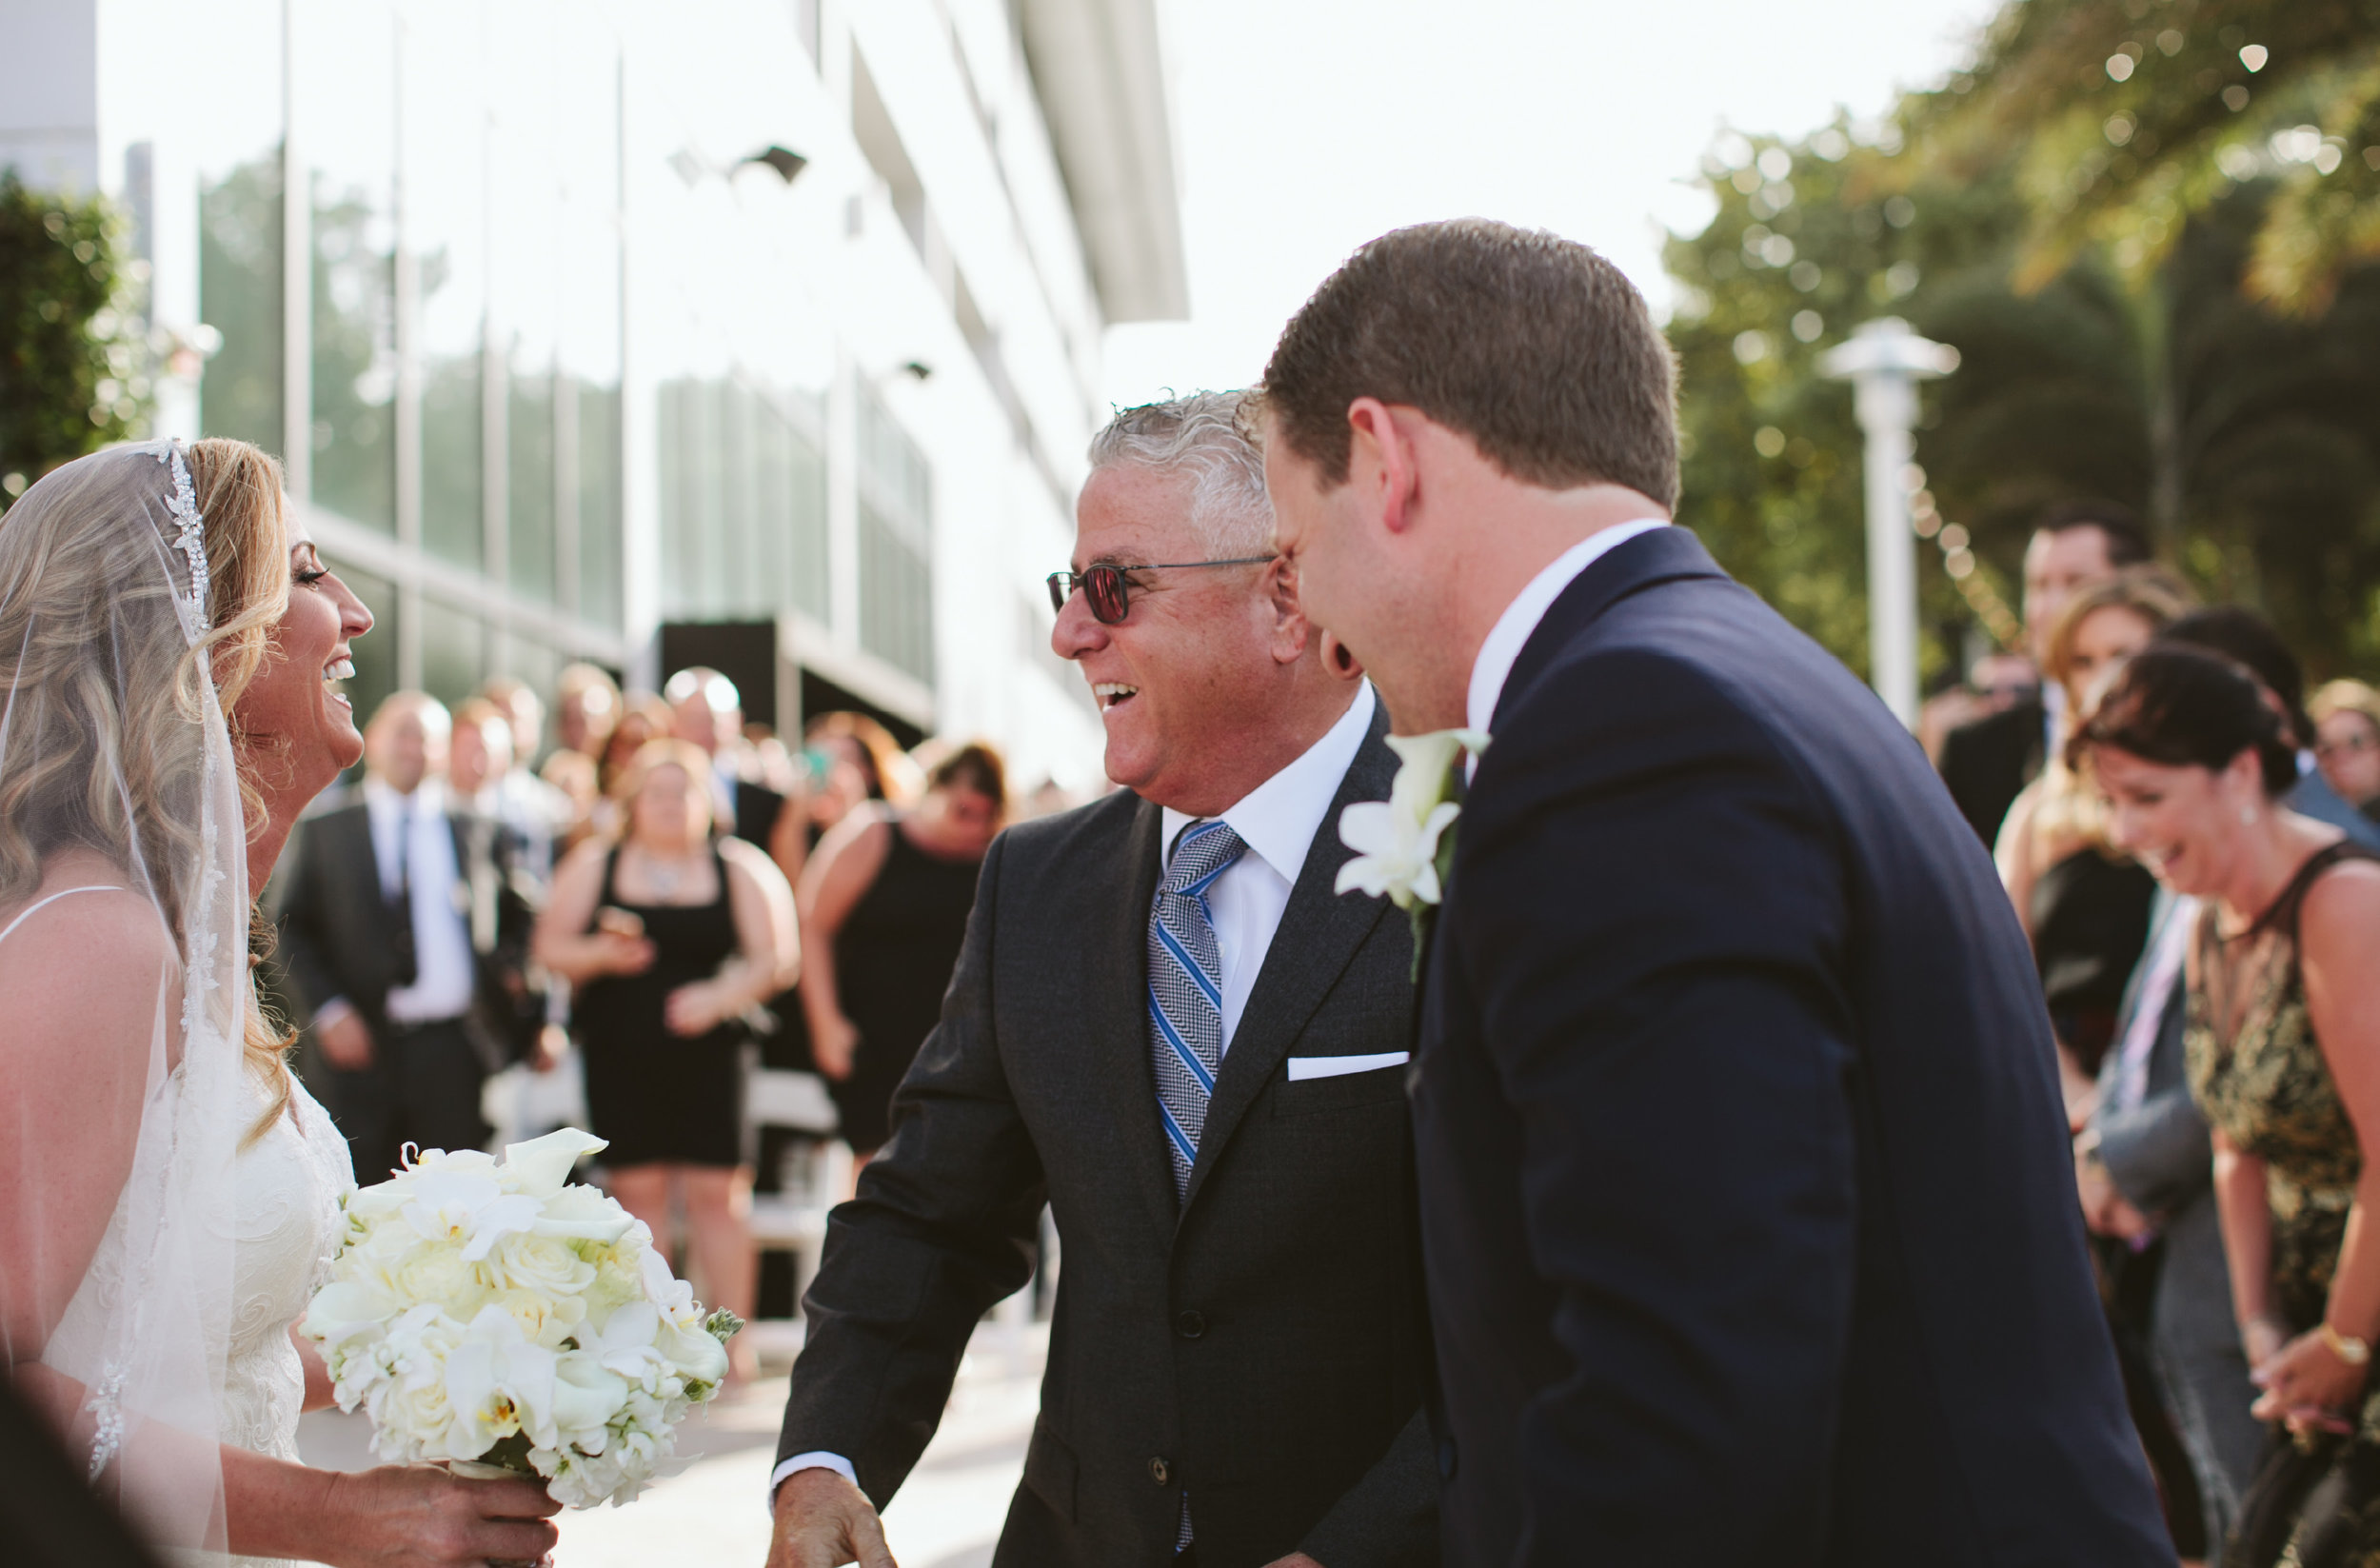 Kim + John's Wedding at the Waterstone Hotel in Boca Raton45.jpg